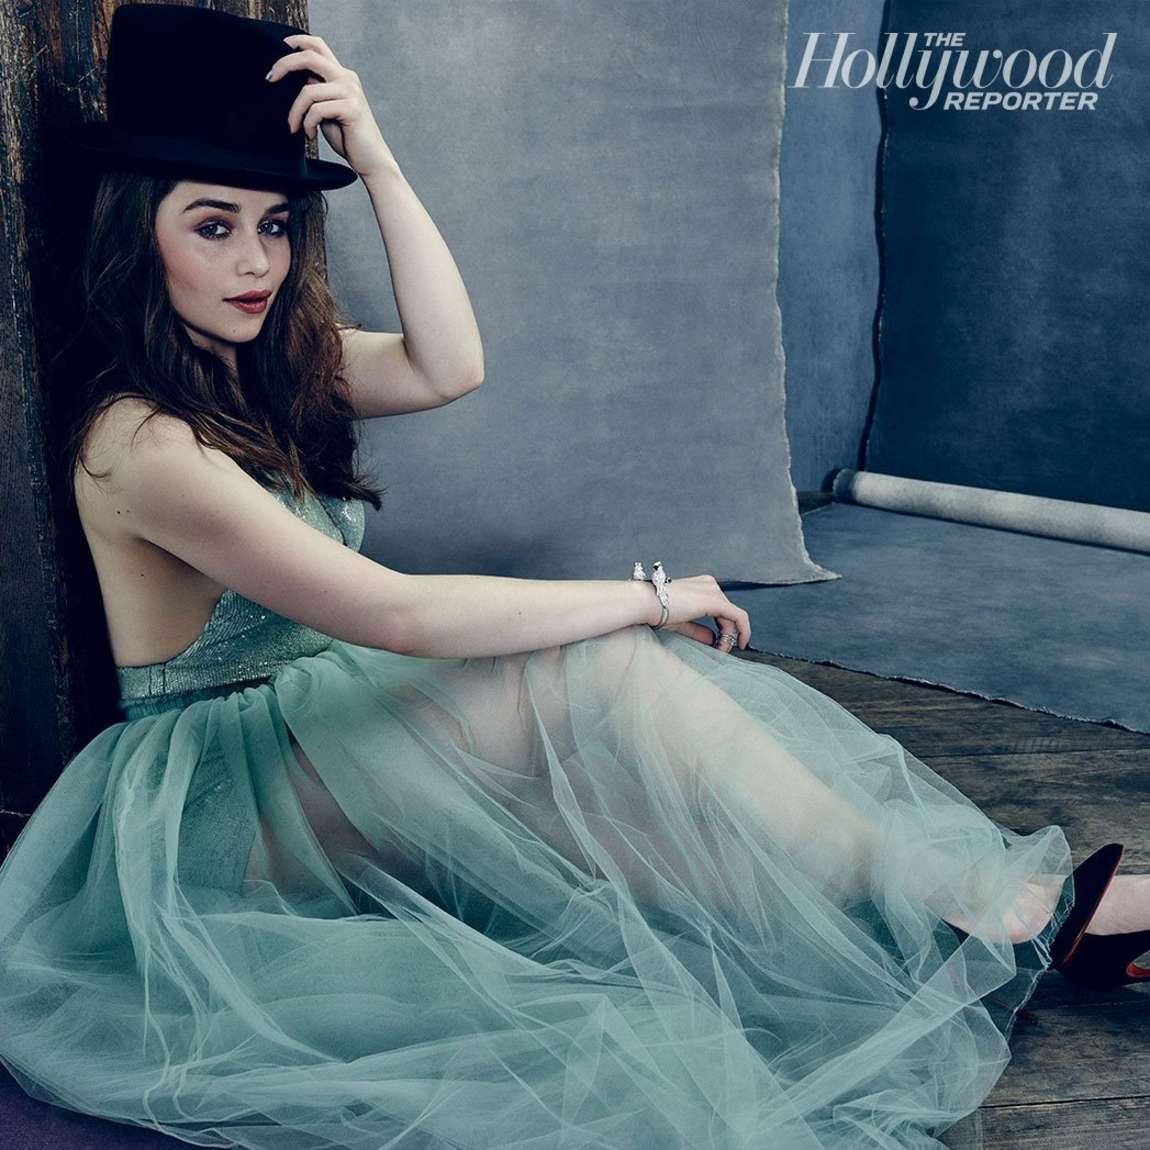 Emilia Clarke 2015 : Emilia Clarke: The Hollywood Reporter 2015 -02